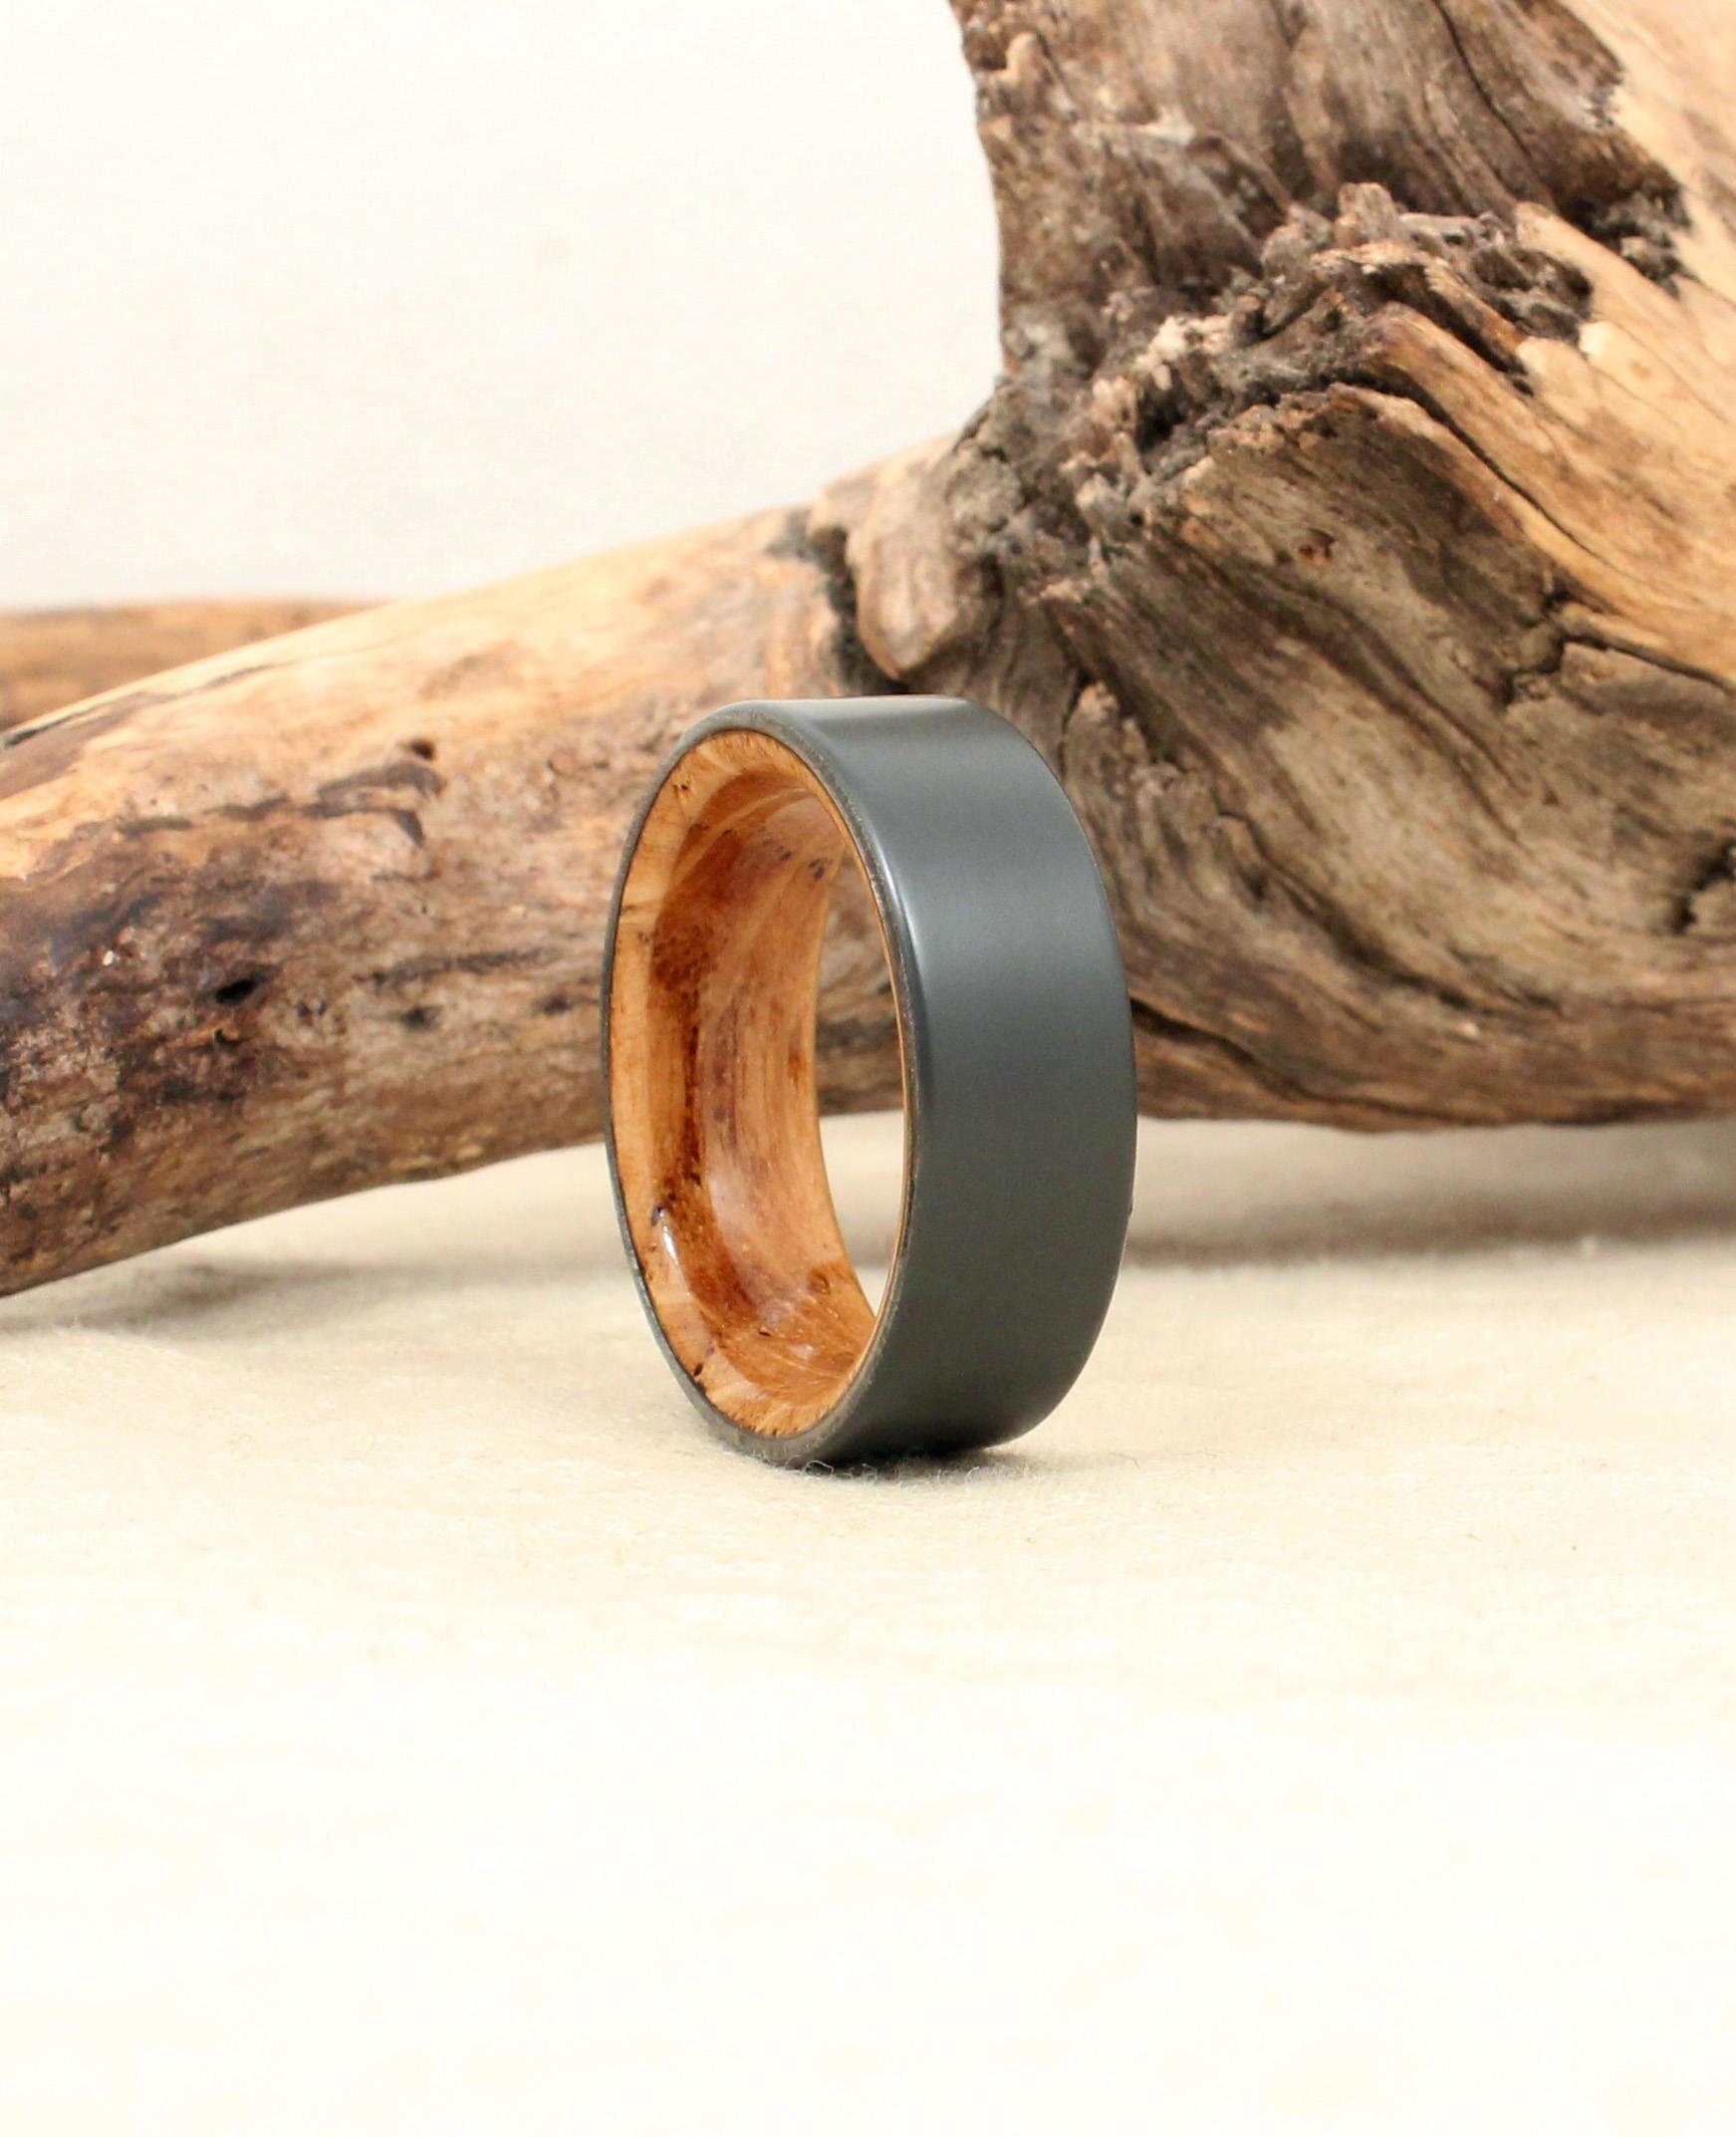 Sandblasted Black Zirconium and Scotch Barrel Wood Ring